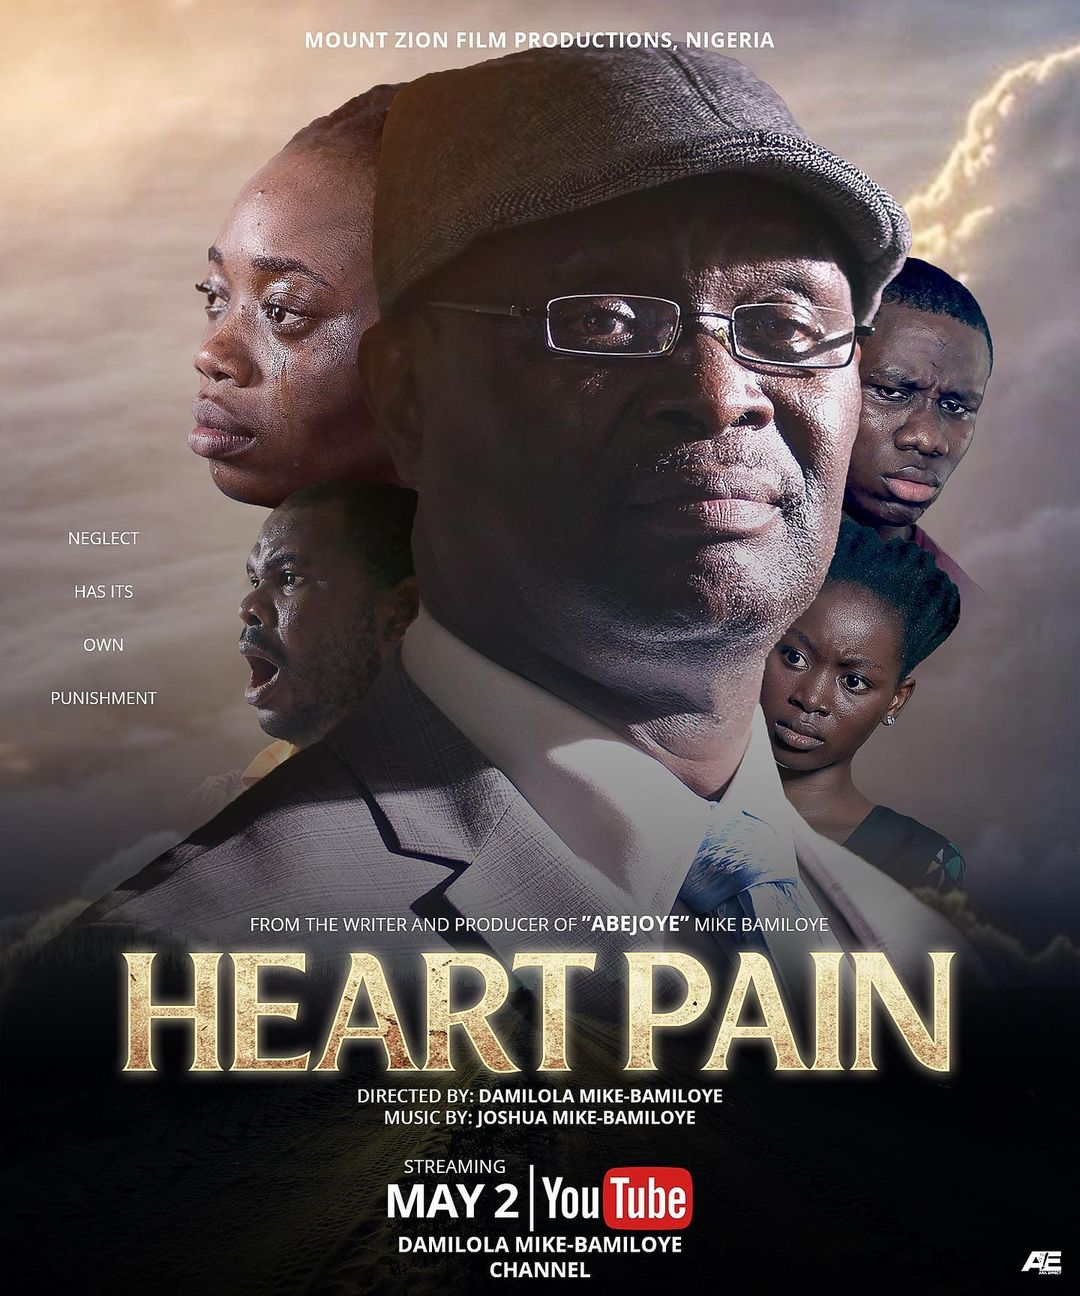 Heart Pain - Mount Zion Film Productions